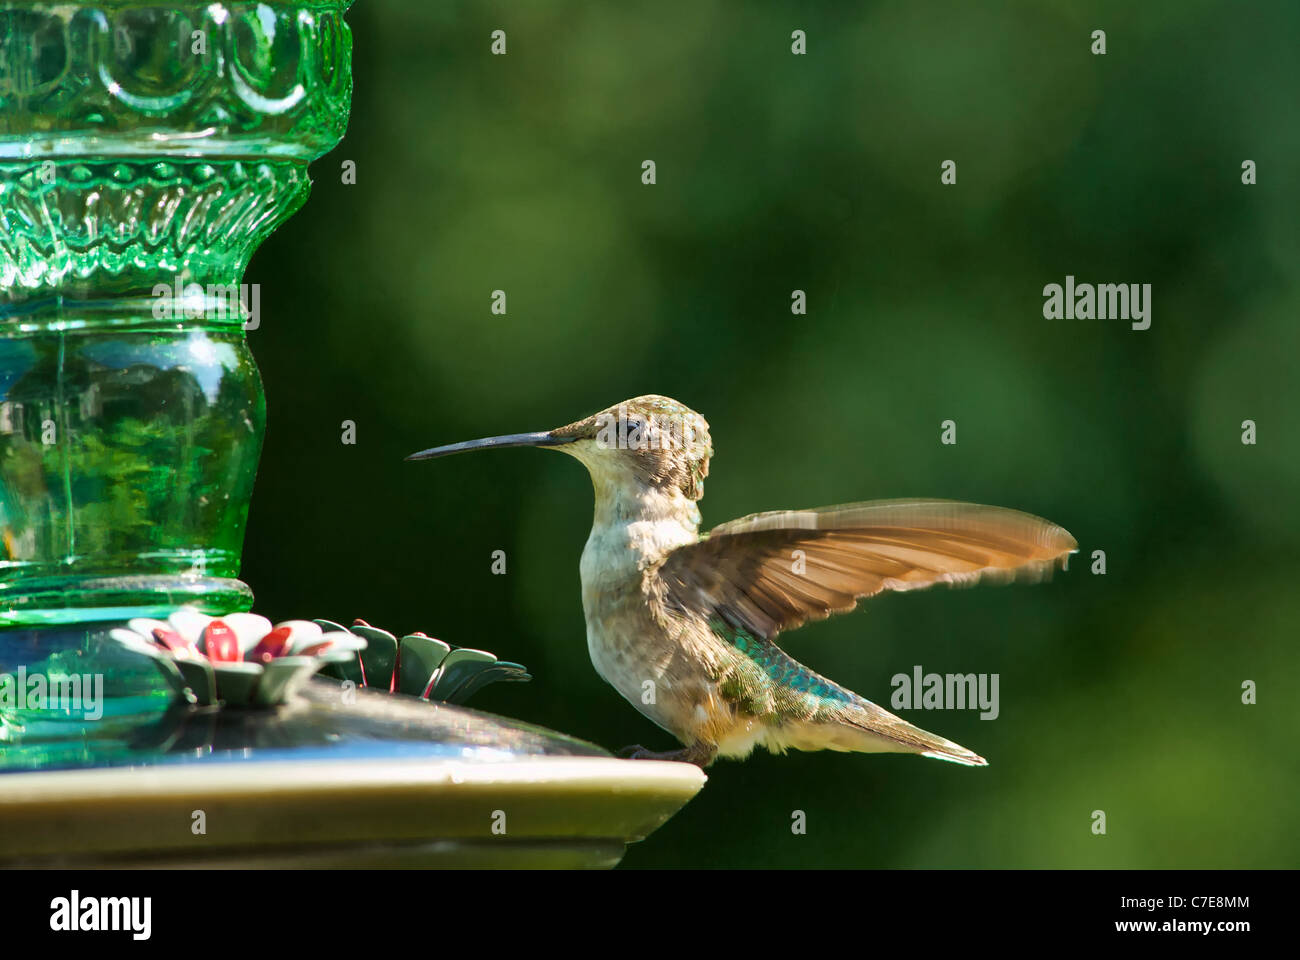 Humming Bird sur convoyeur en plein air Photo Stock